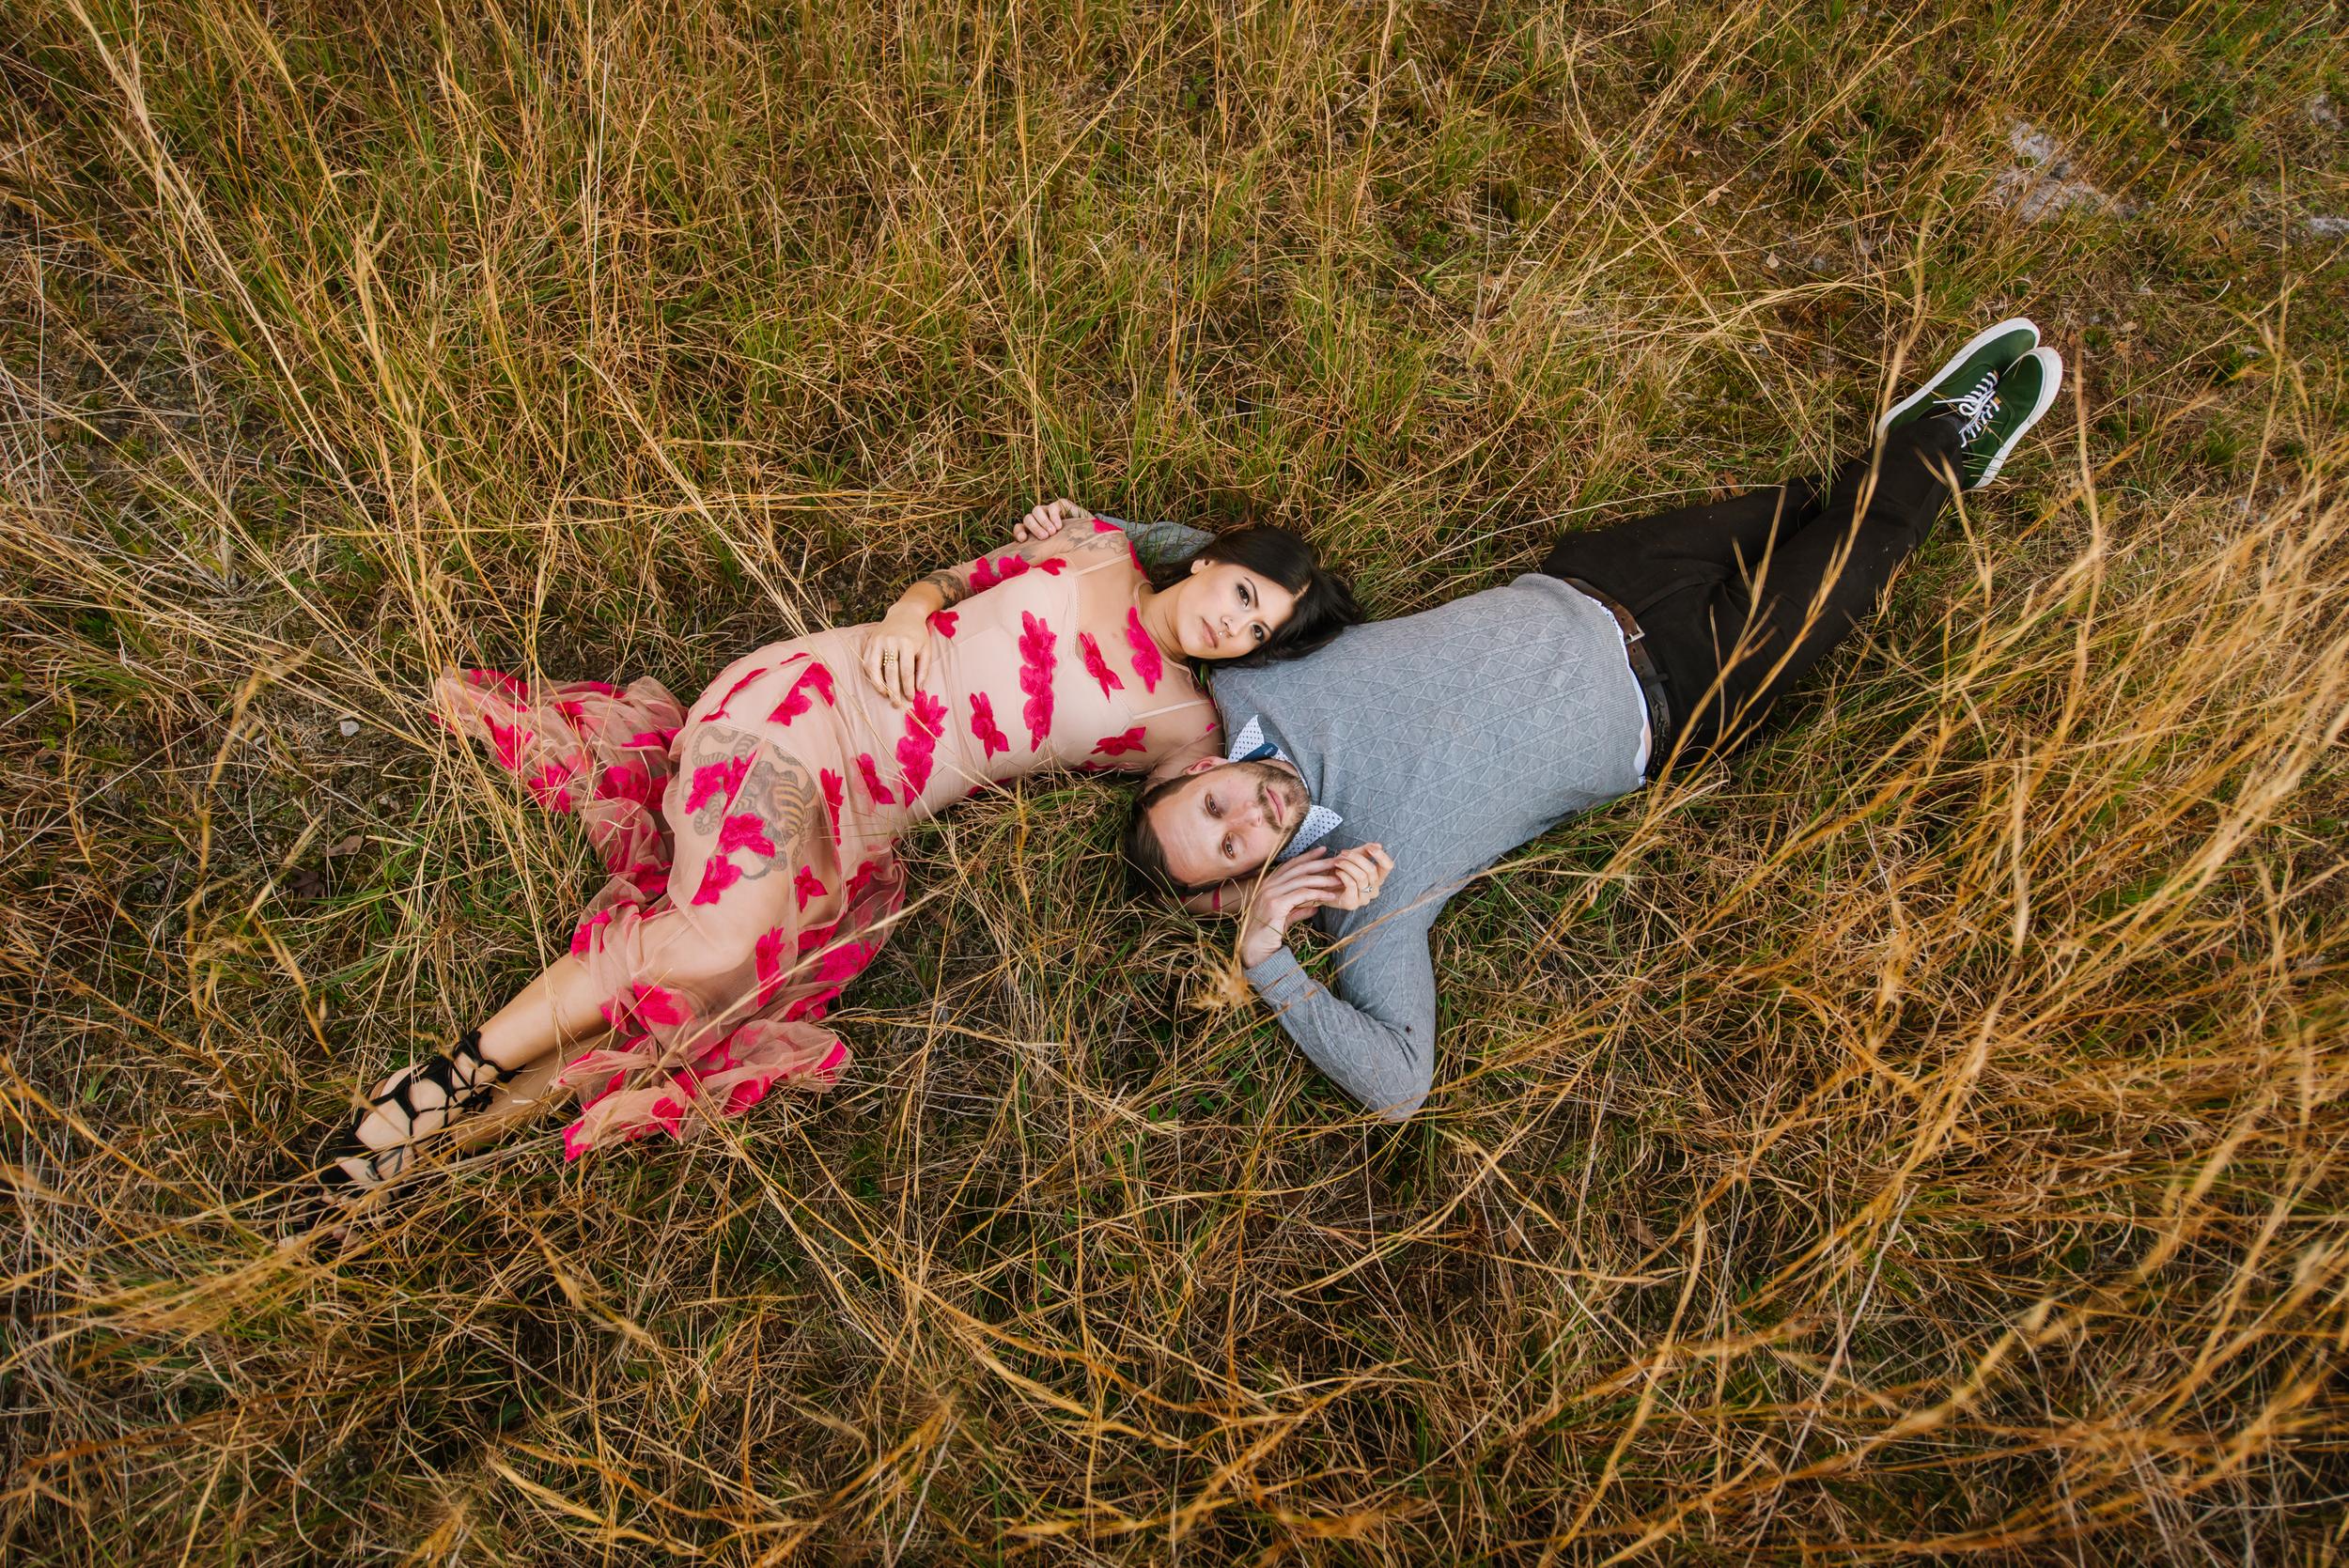 tampa-engagement-photographer-fun-vibrant-morris-bridge-outdoor-romantic